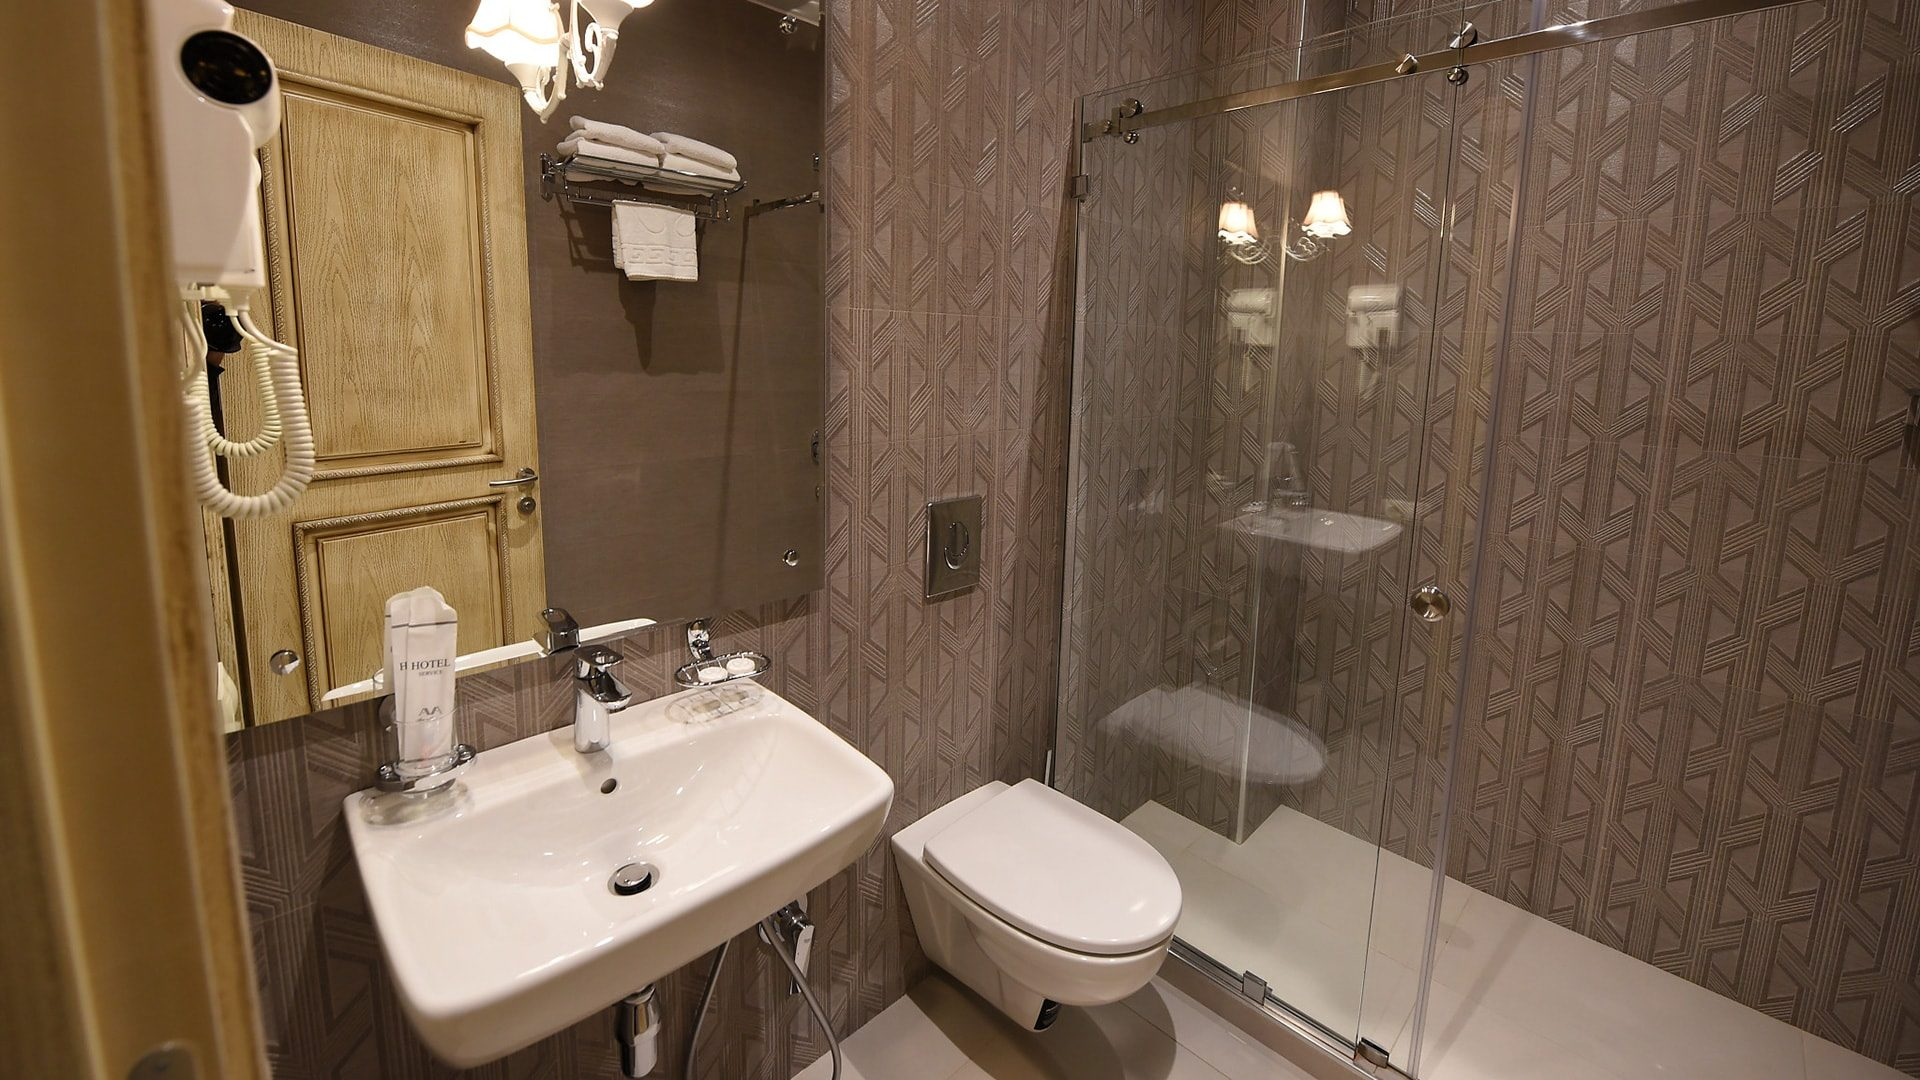 Standart room of the Grand hotel ''Mimino''